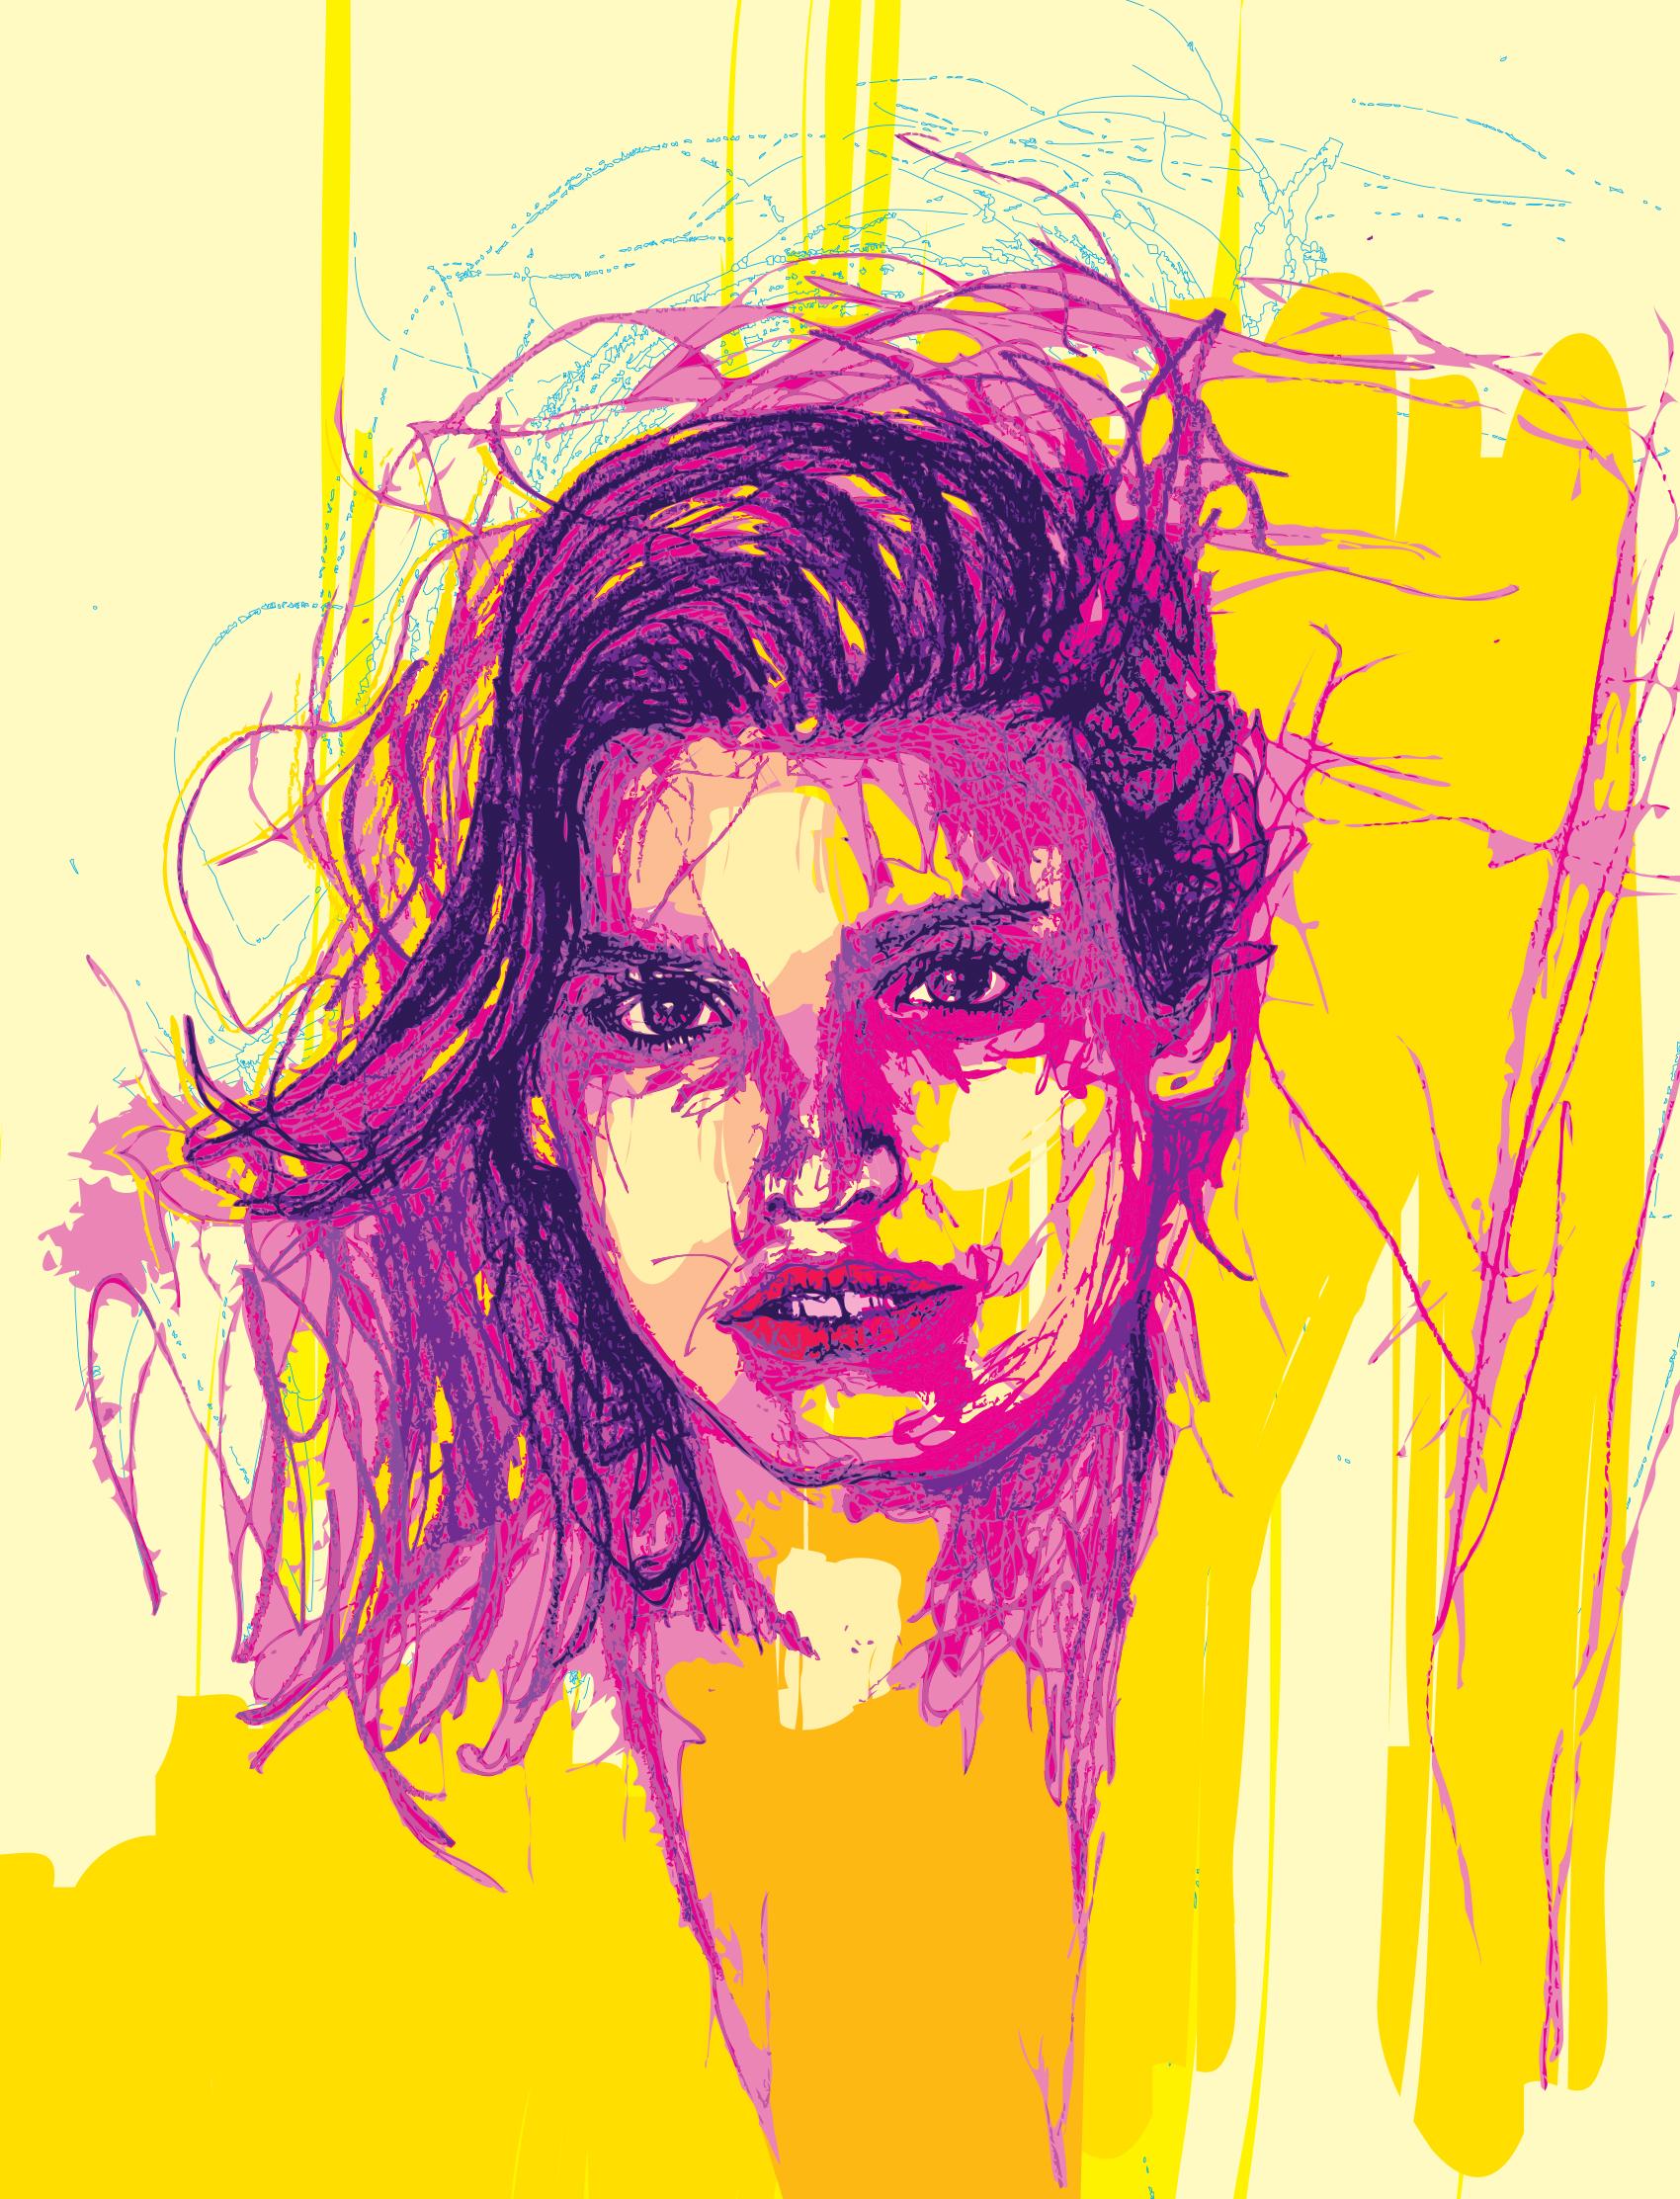 Gia Marie Carangi - Drawing